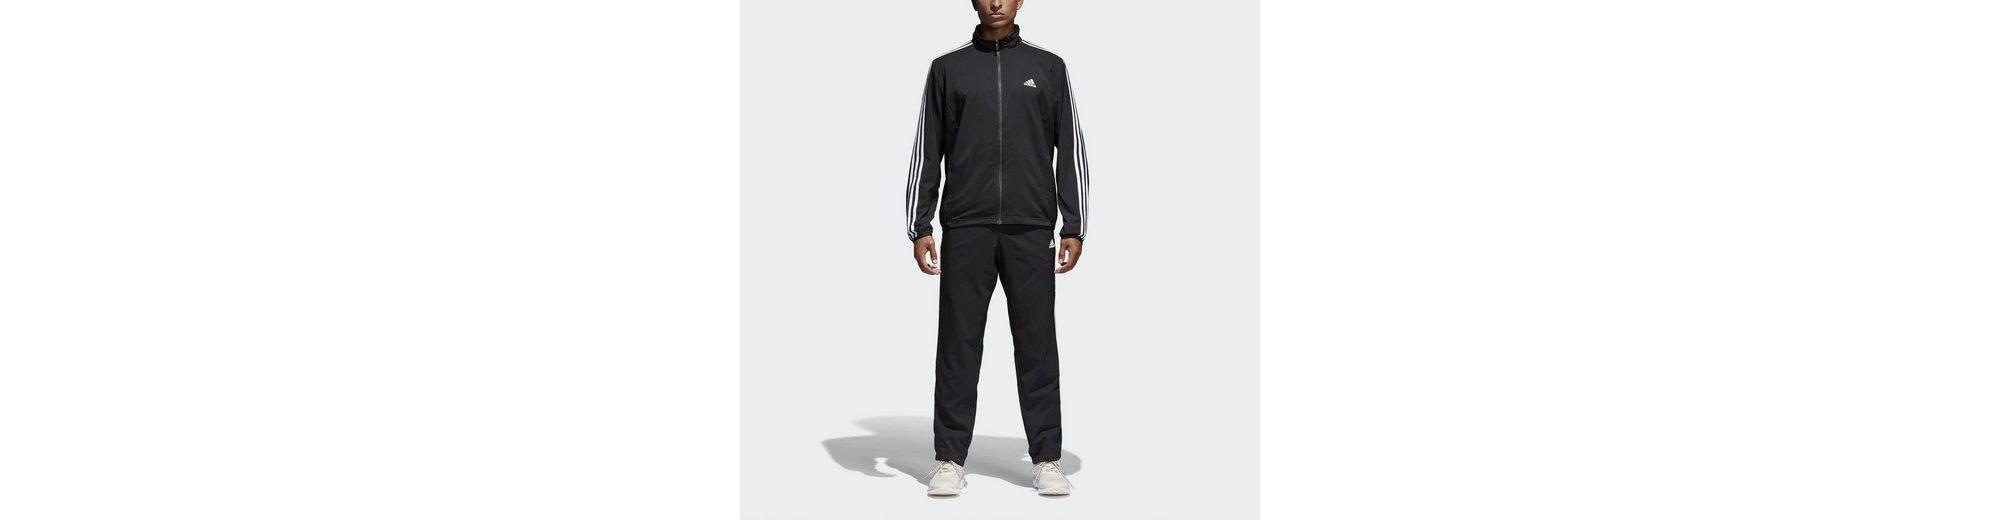 adidas Performance Trainingsanzug Light Trainingsanzug Billig Verkauf Suchen EhXCahUv9n